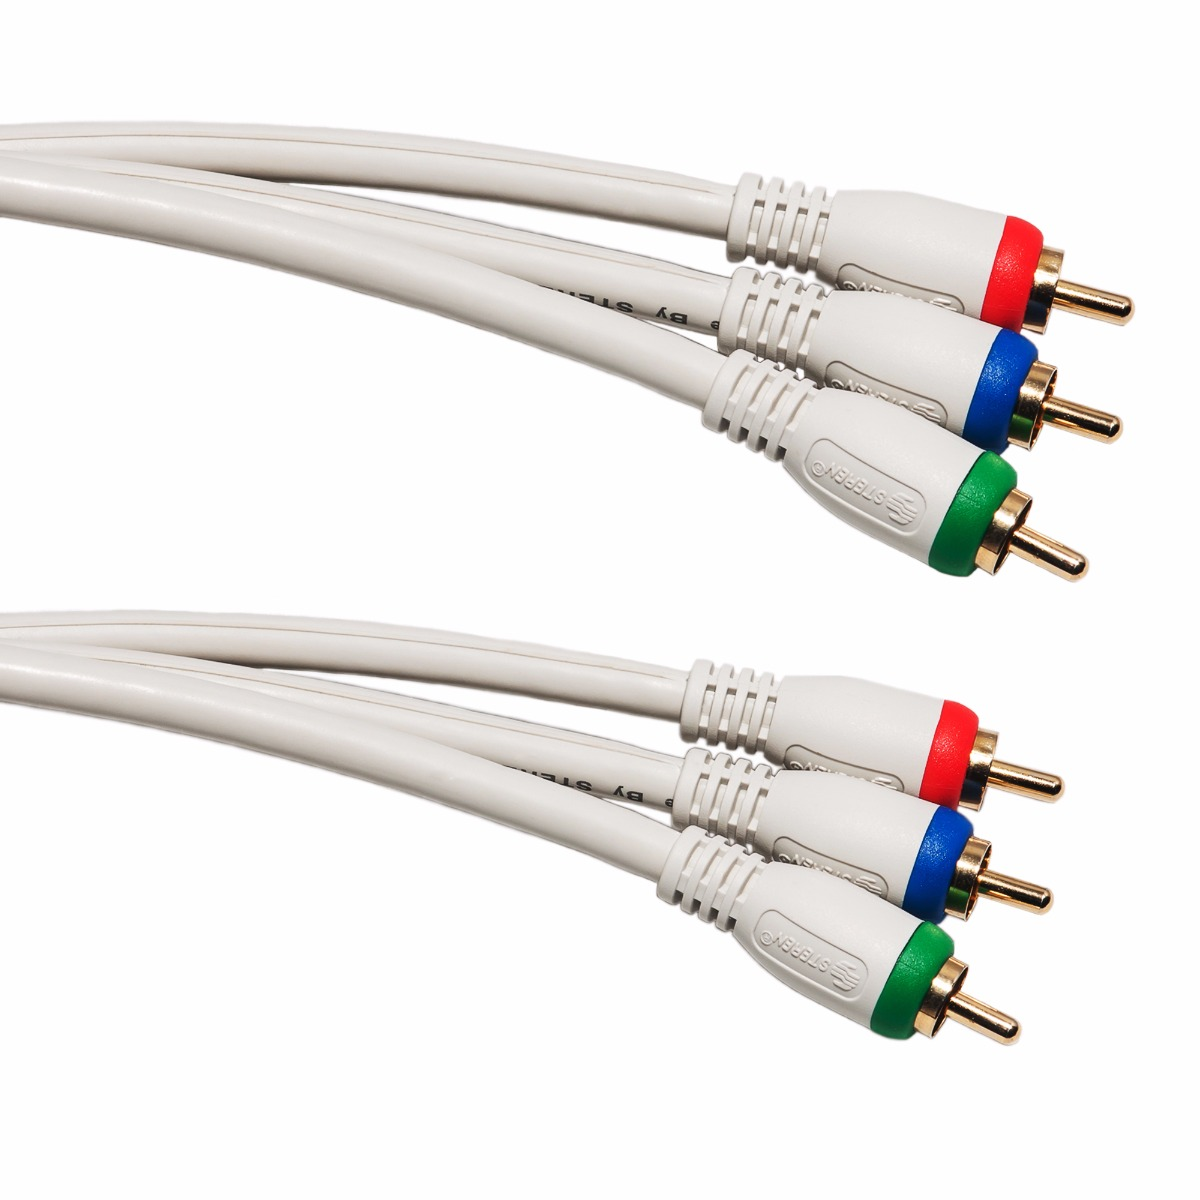 Component RCA Video Cables Shielded | ShowMeCables.com